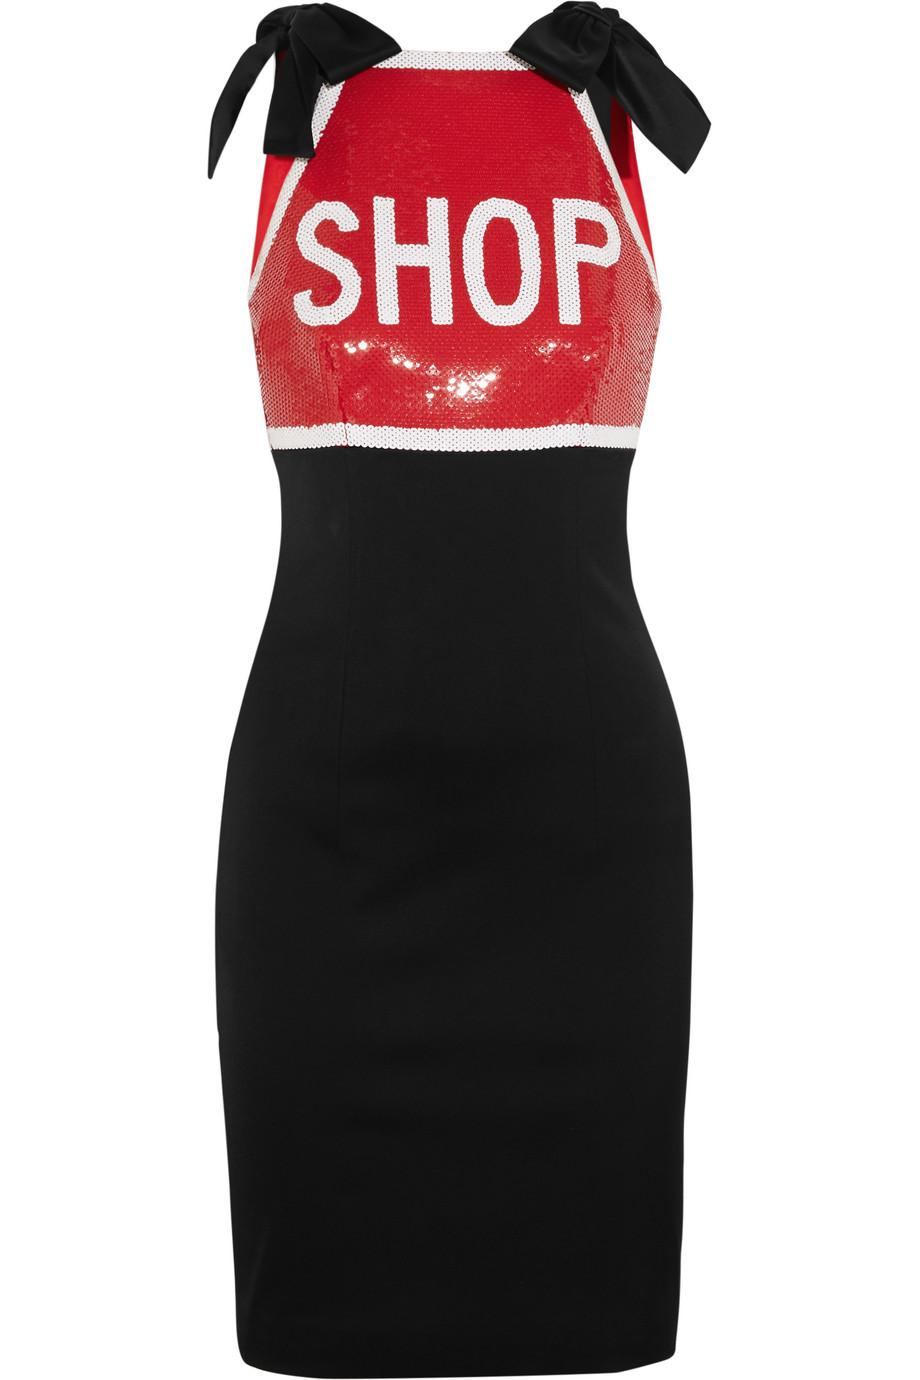 Moschino Sequin-Embellished Stretch-Satin Mini Dress, Black, Women's, Size: 46